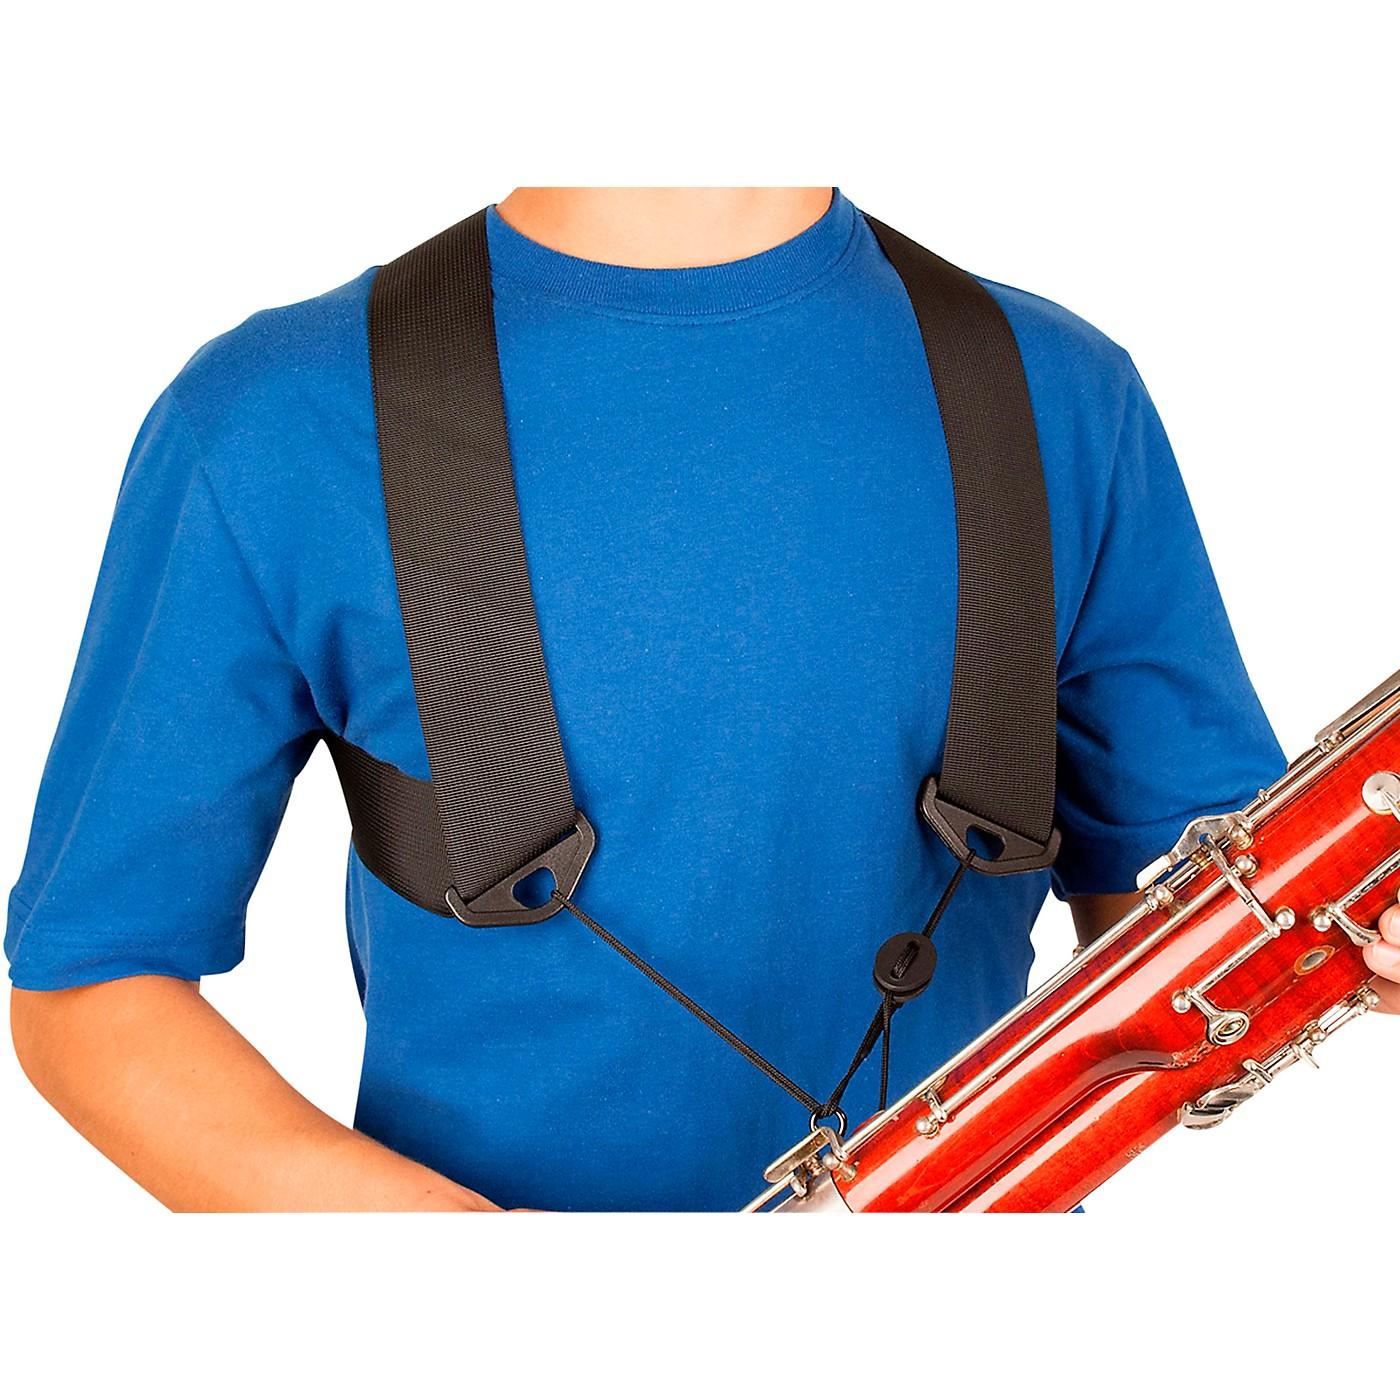 Protec Bassoon Nylon Harness (Small, Unisex) thumbnail